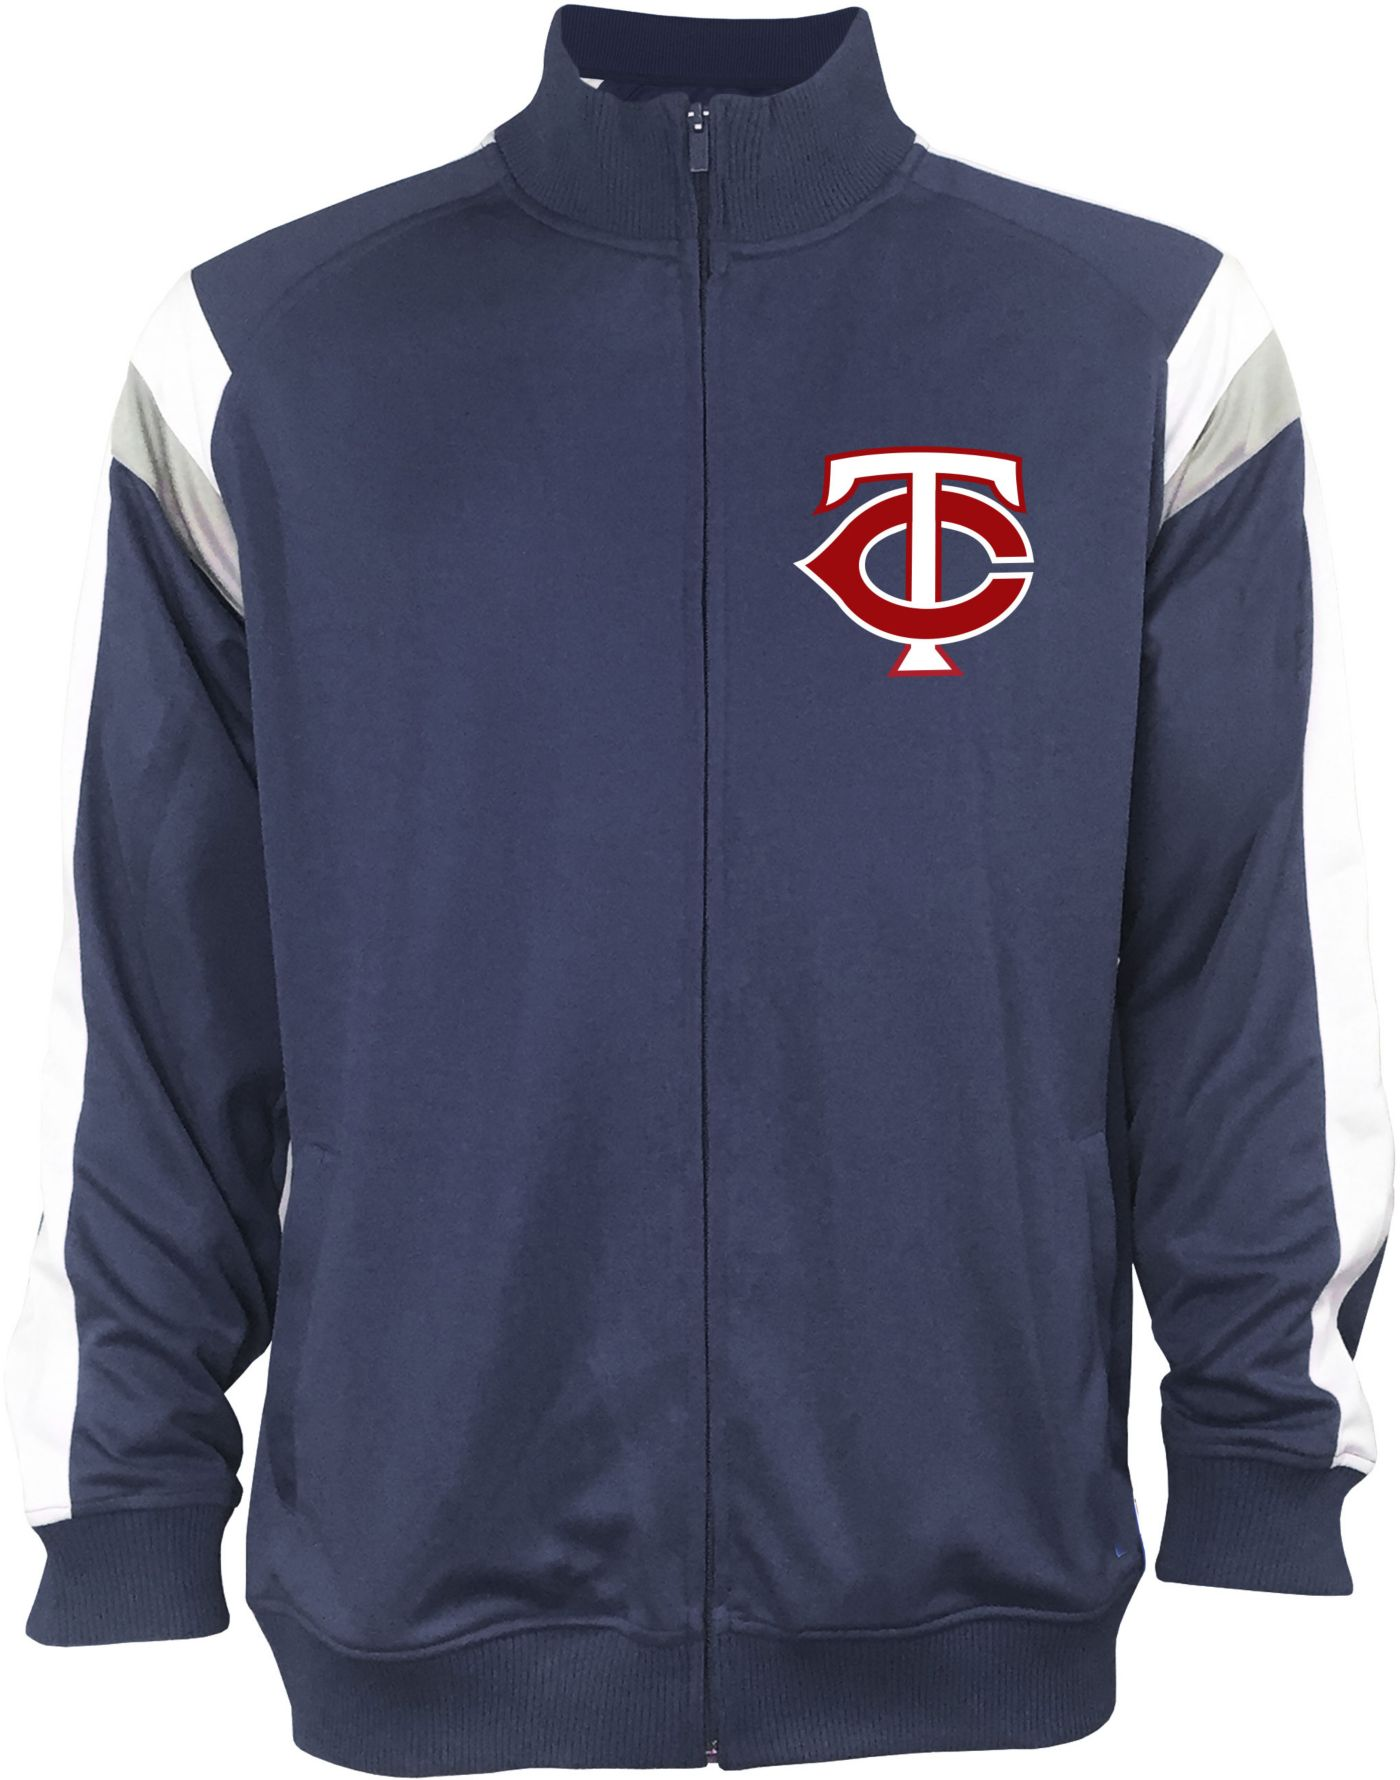 Stitches Men's Minnesota Twins Track Jacket